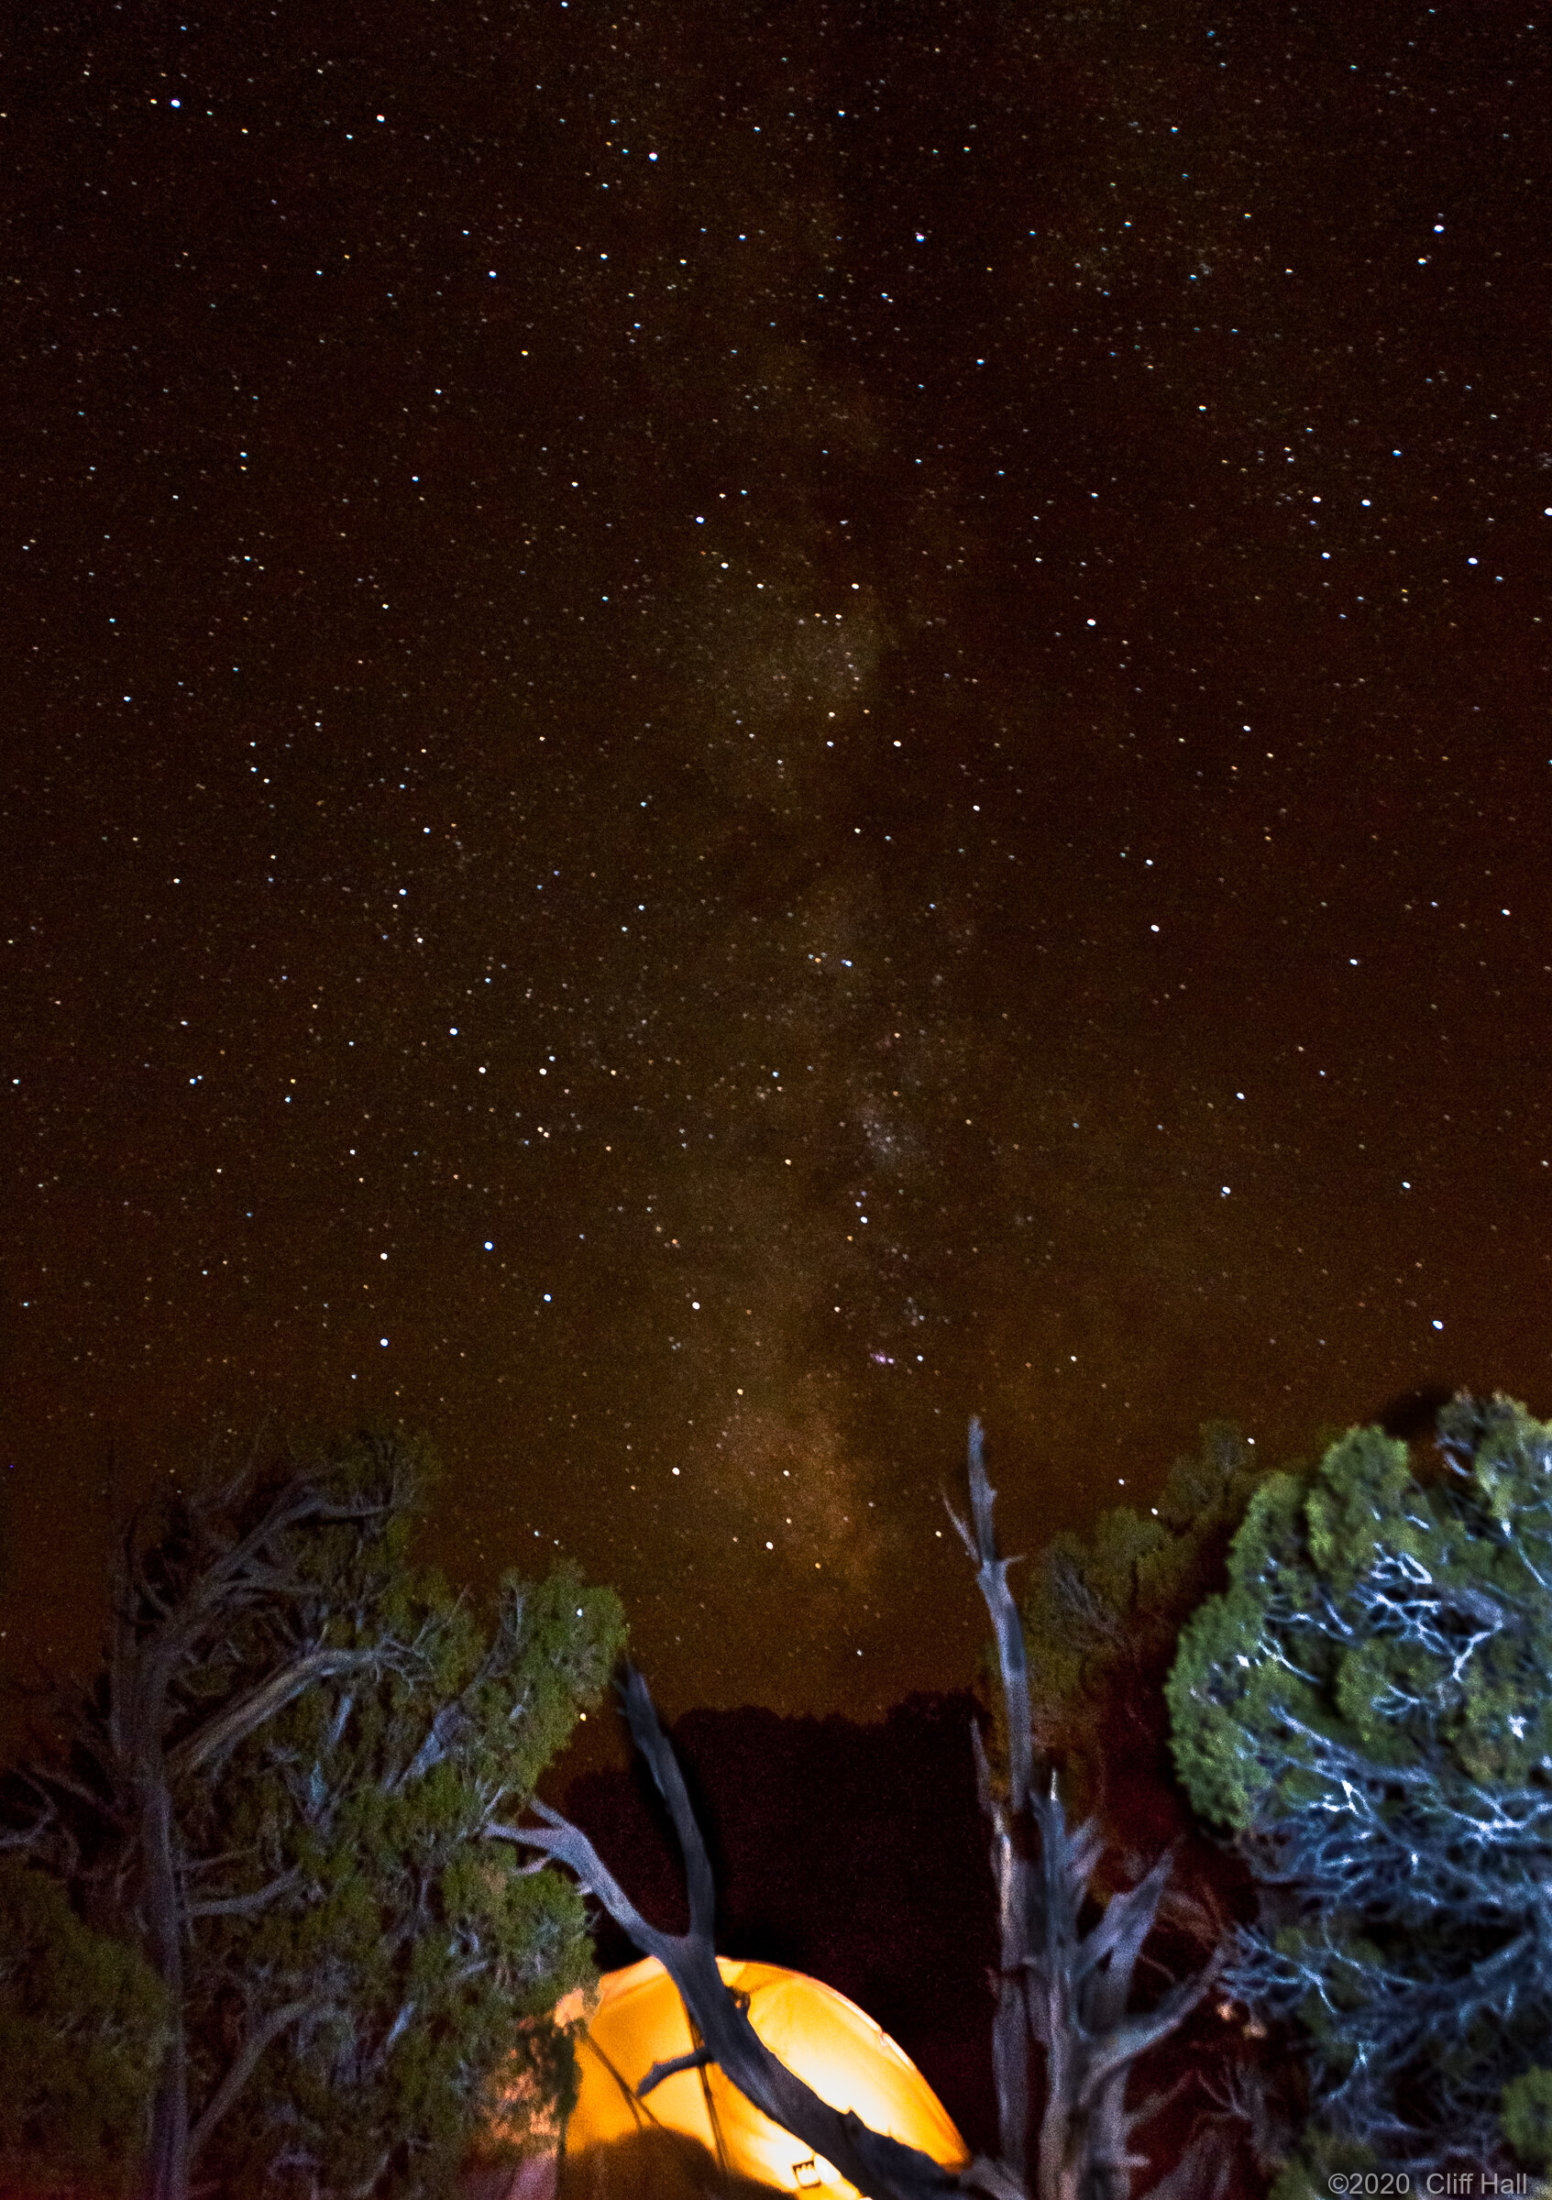 Sleeping under the Milky Way